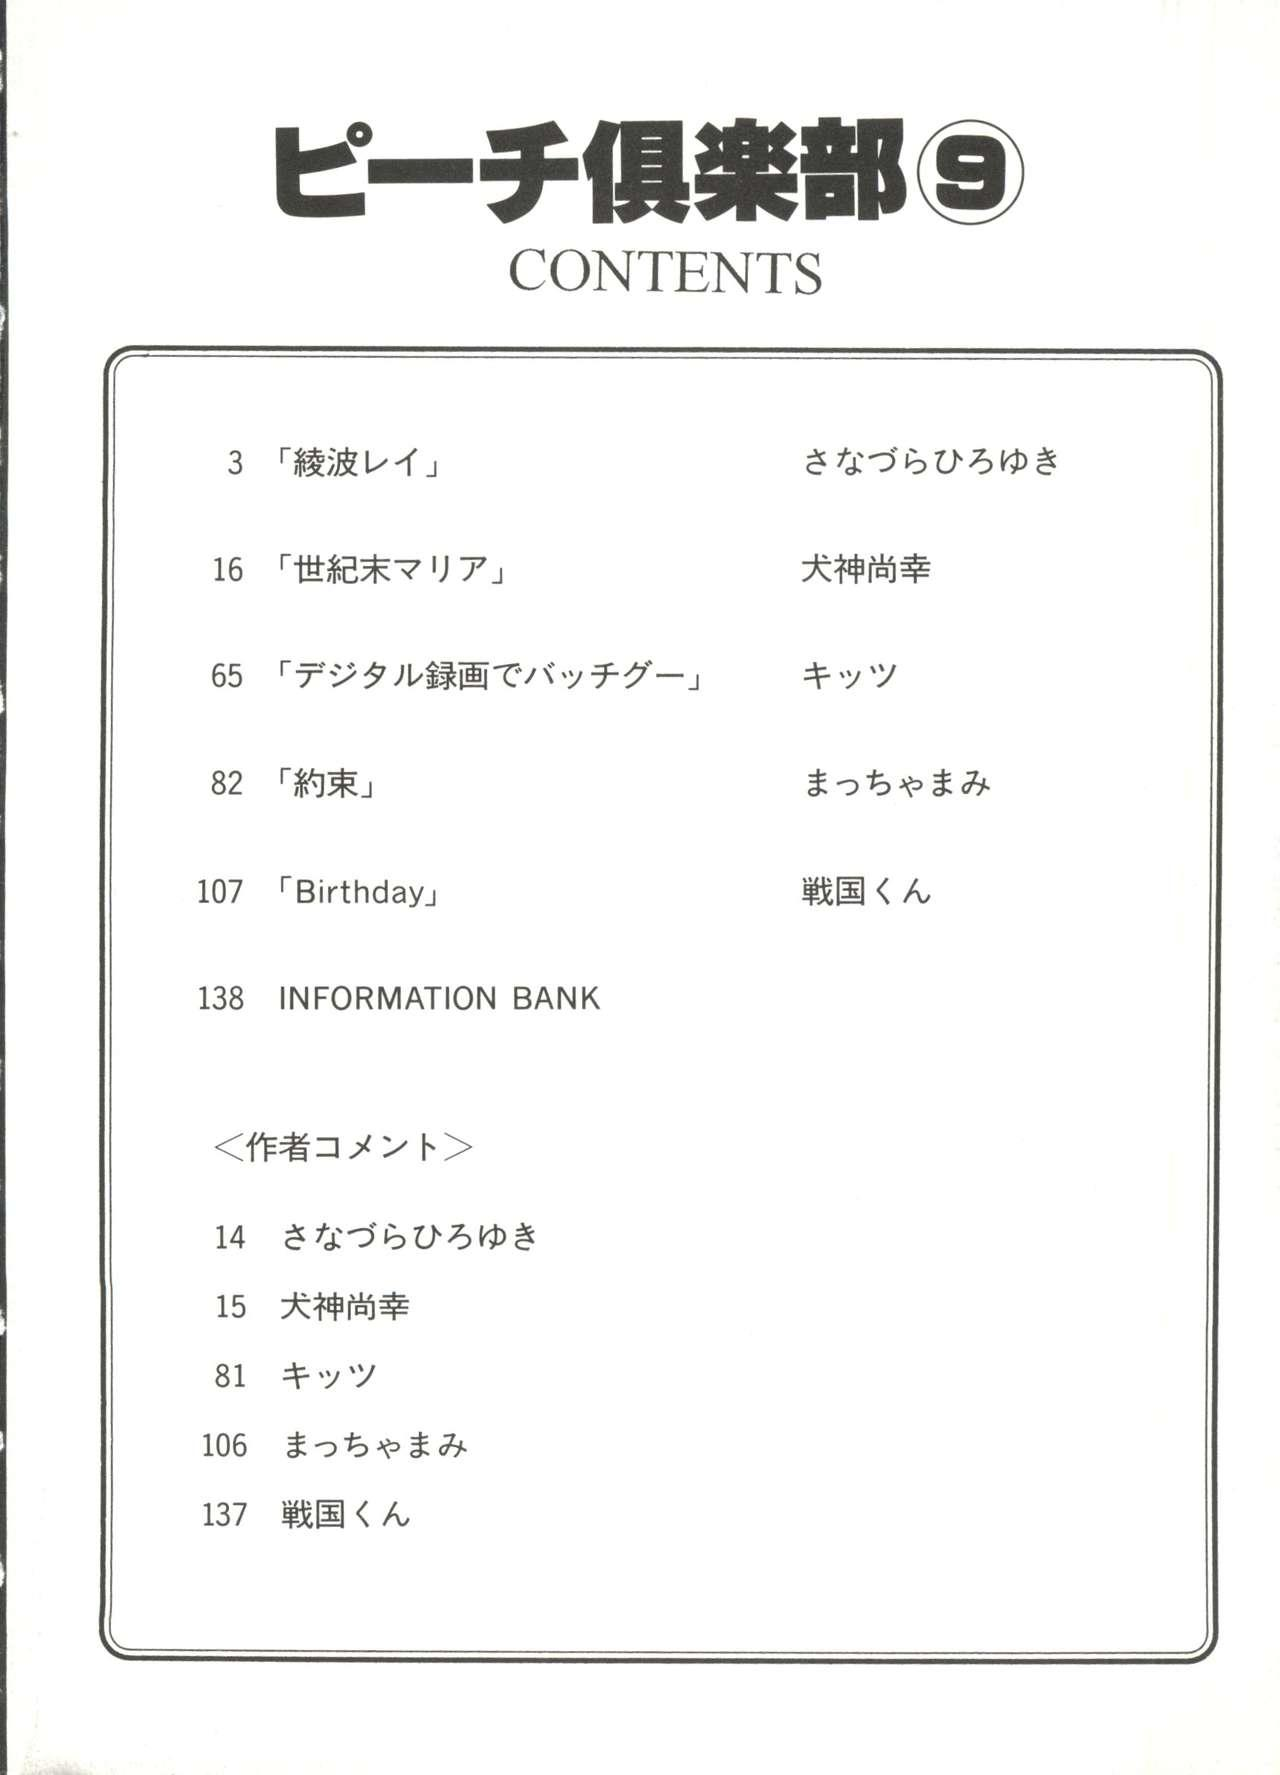 Bishoujo Doujin Peach Club - Pretty Gal's Fanzine Peach Club 9 3